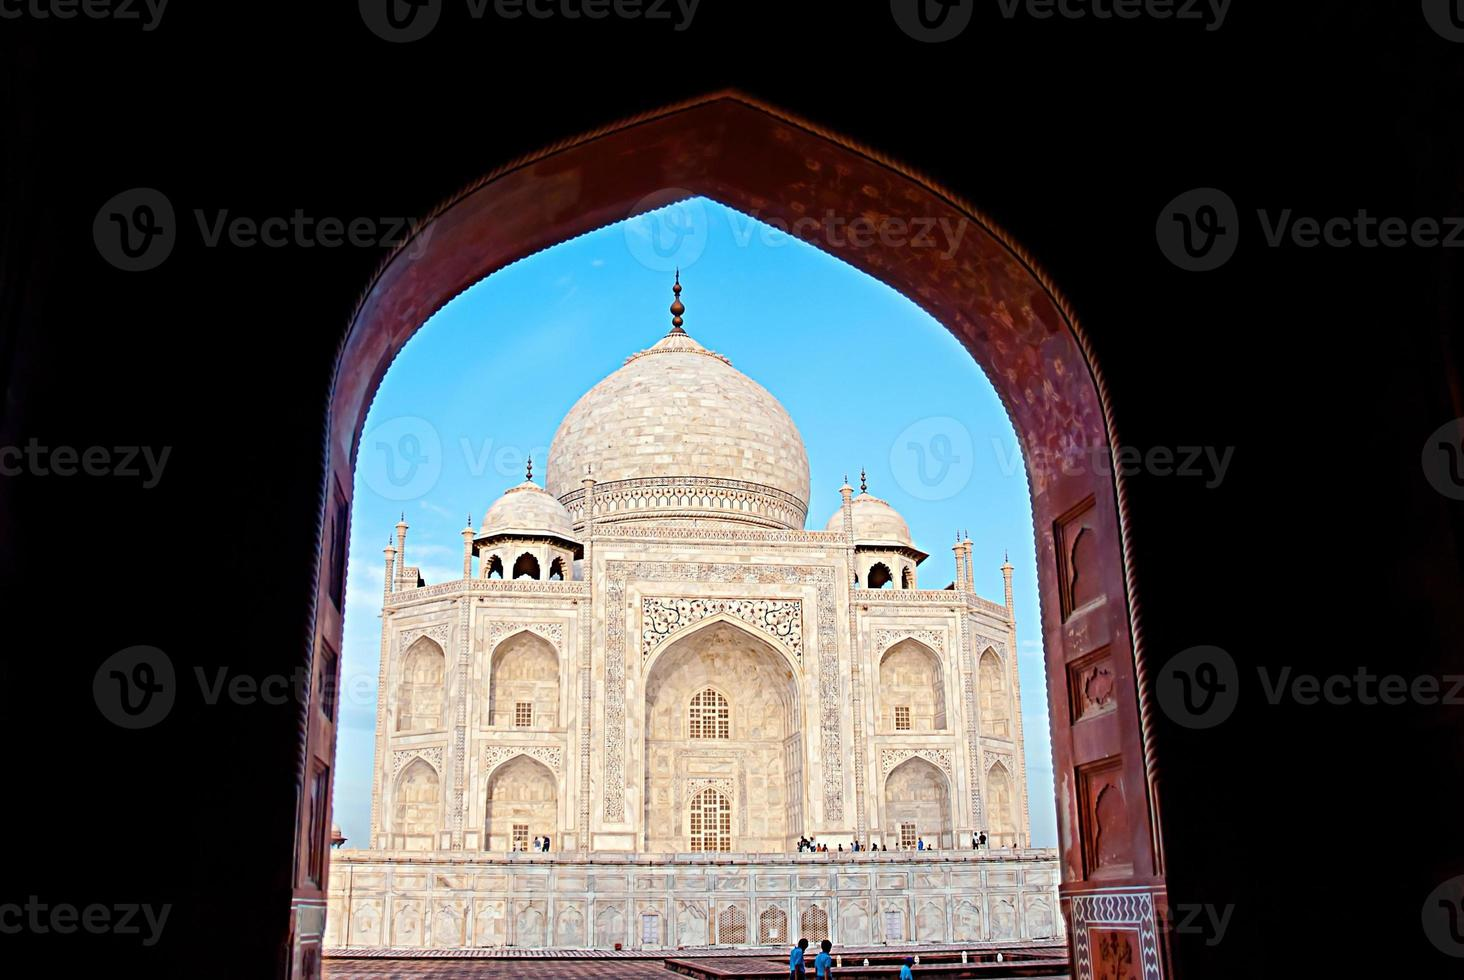 Indien. Taj Mahal. Islam Architektur. Tür zur Moschee foto